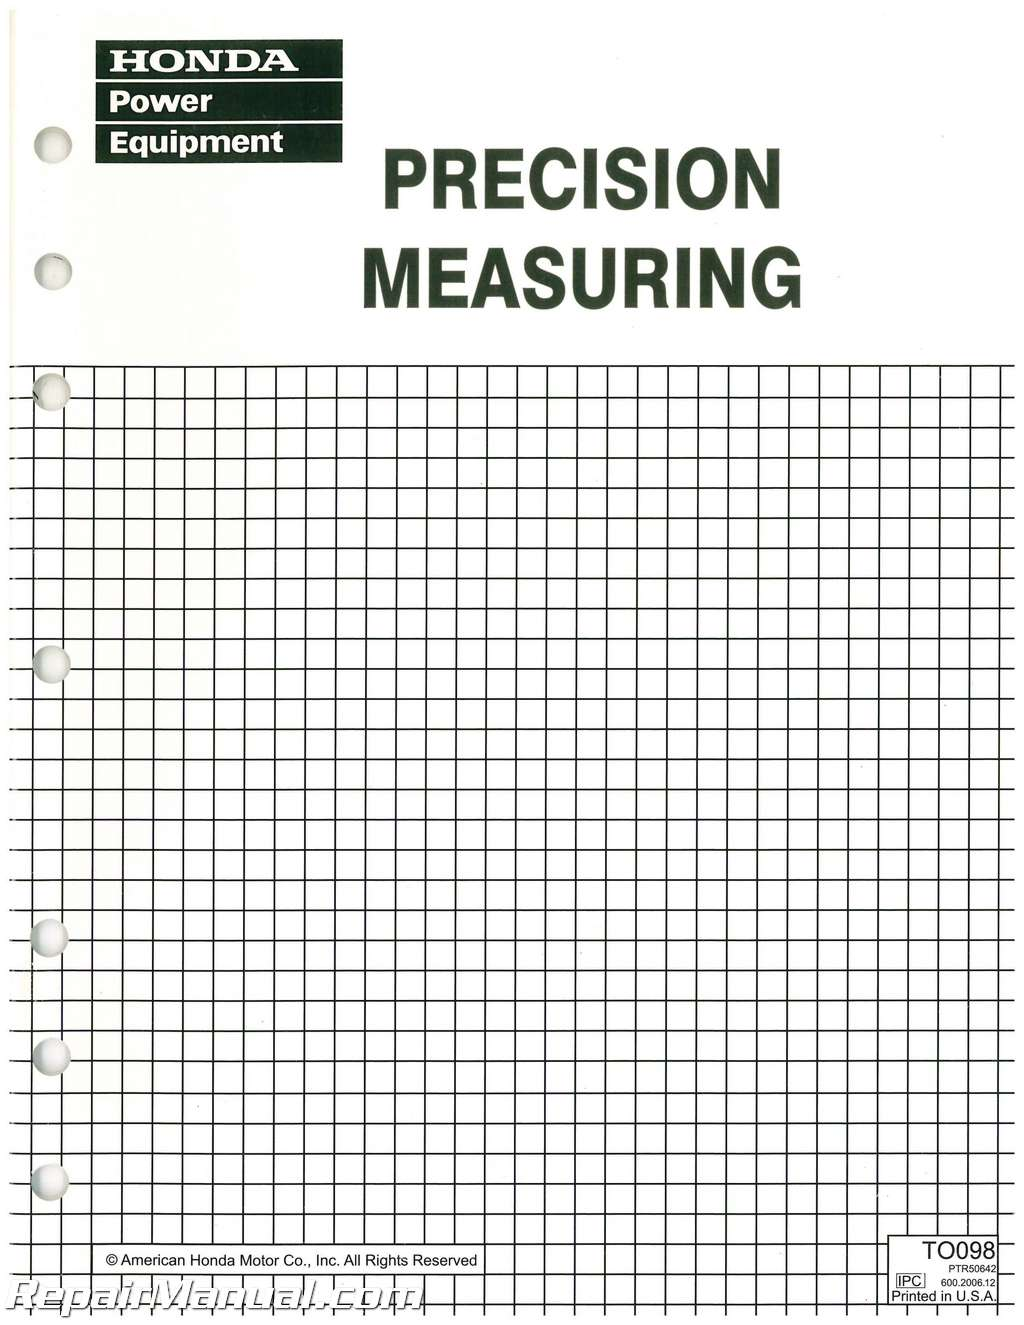 Honda Precision Measuring Manual